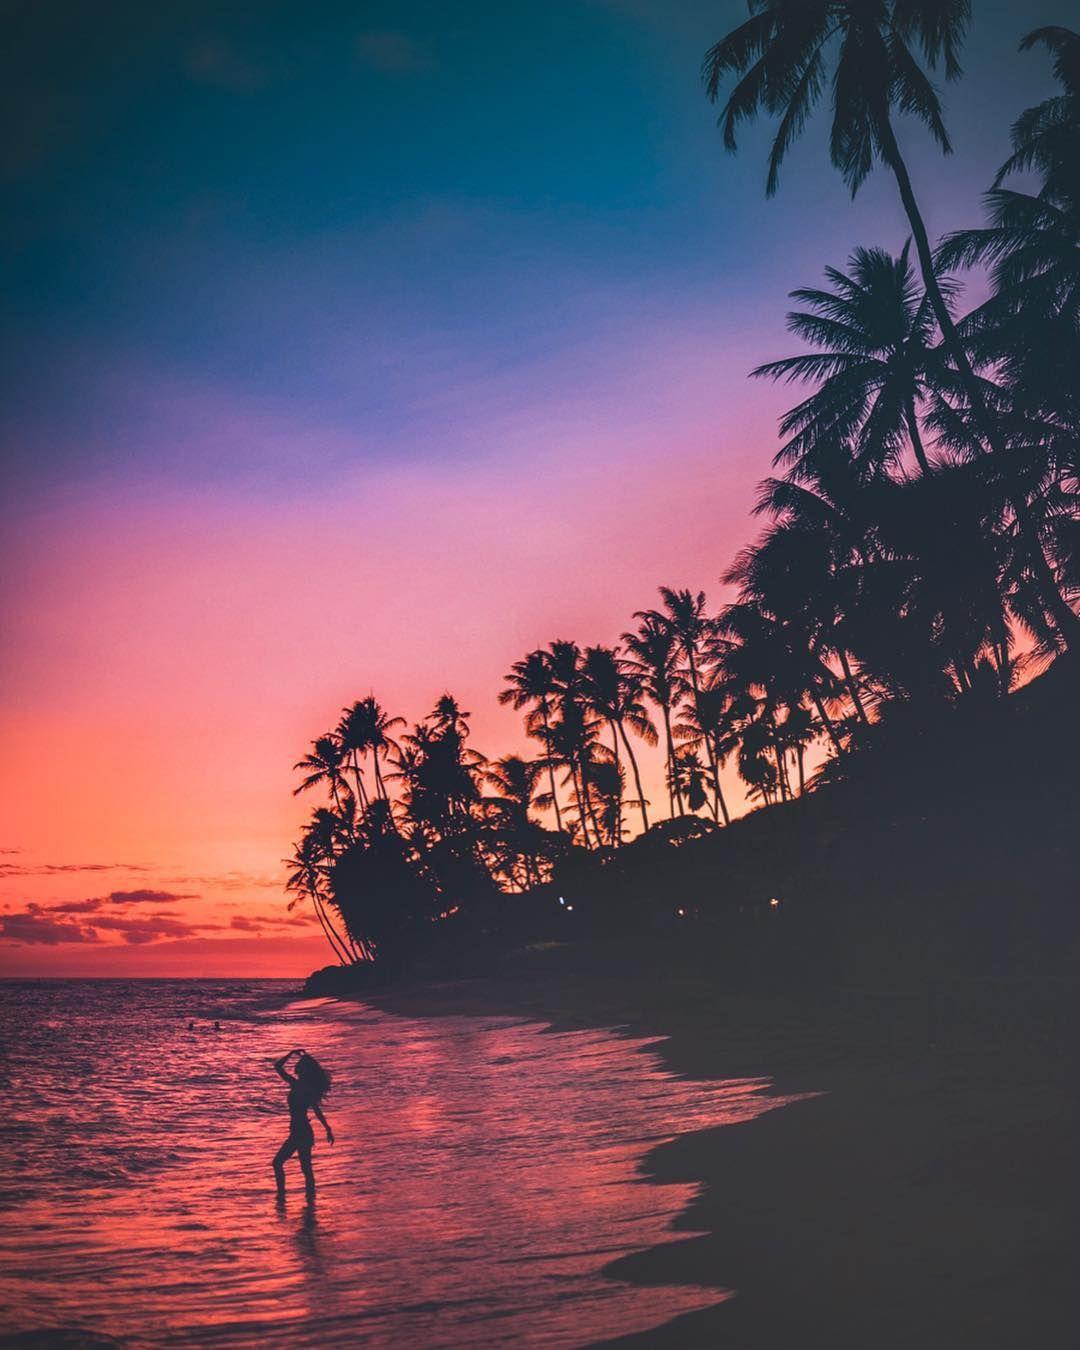 Nolan Omura Nolanomura Amazing Hawaii Photography Sunset Silhouette Sunset Silhouette Landscape Silhouette Nature Photography